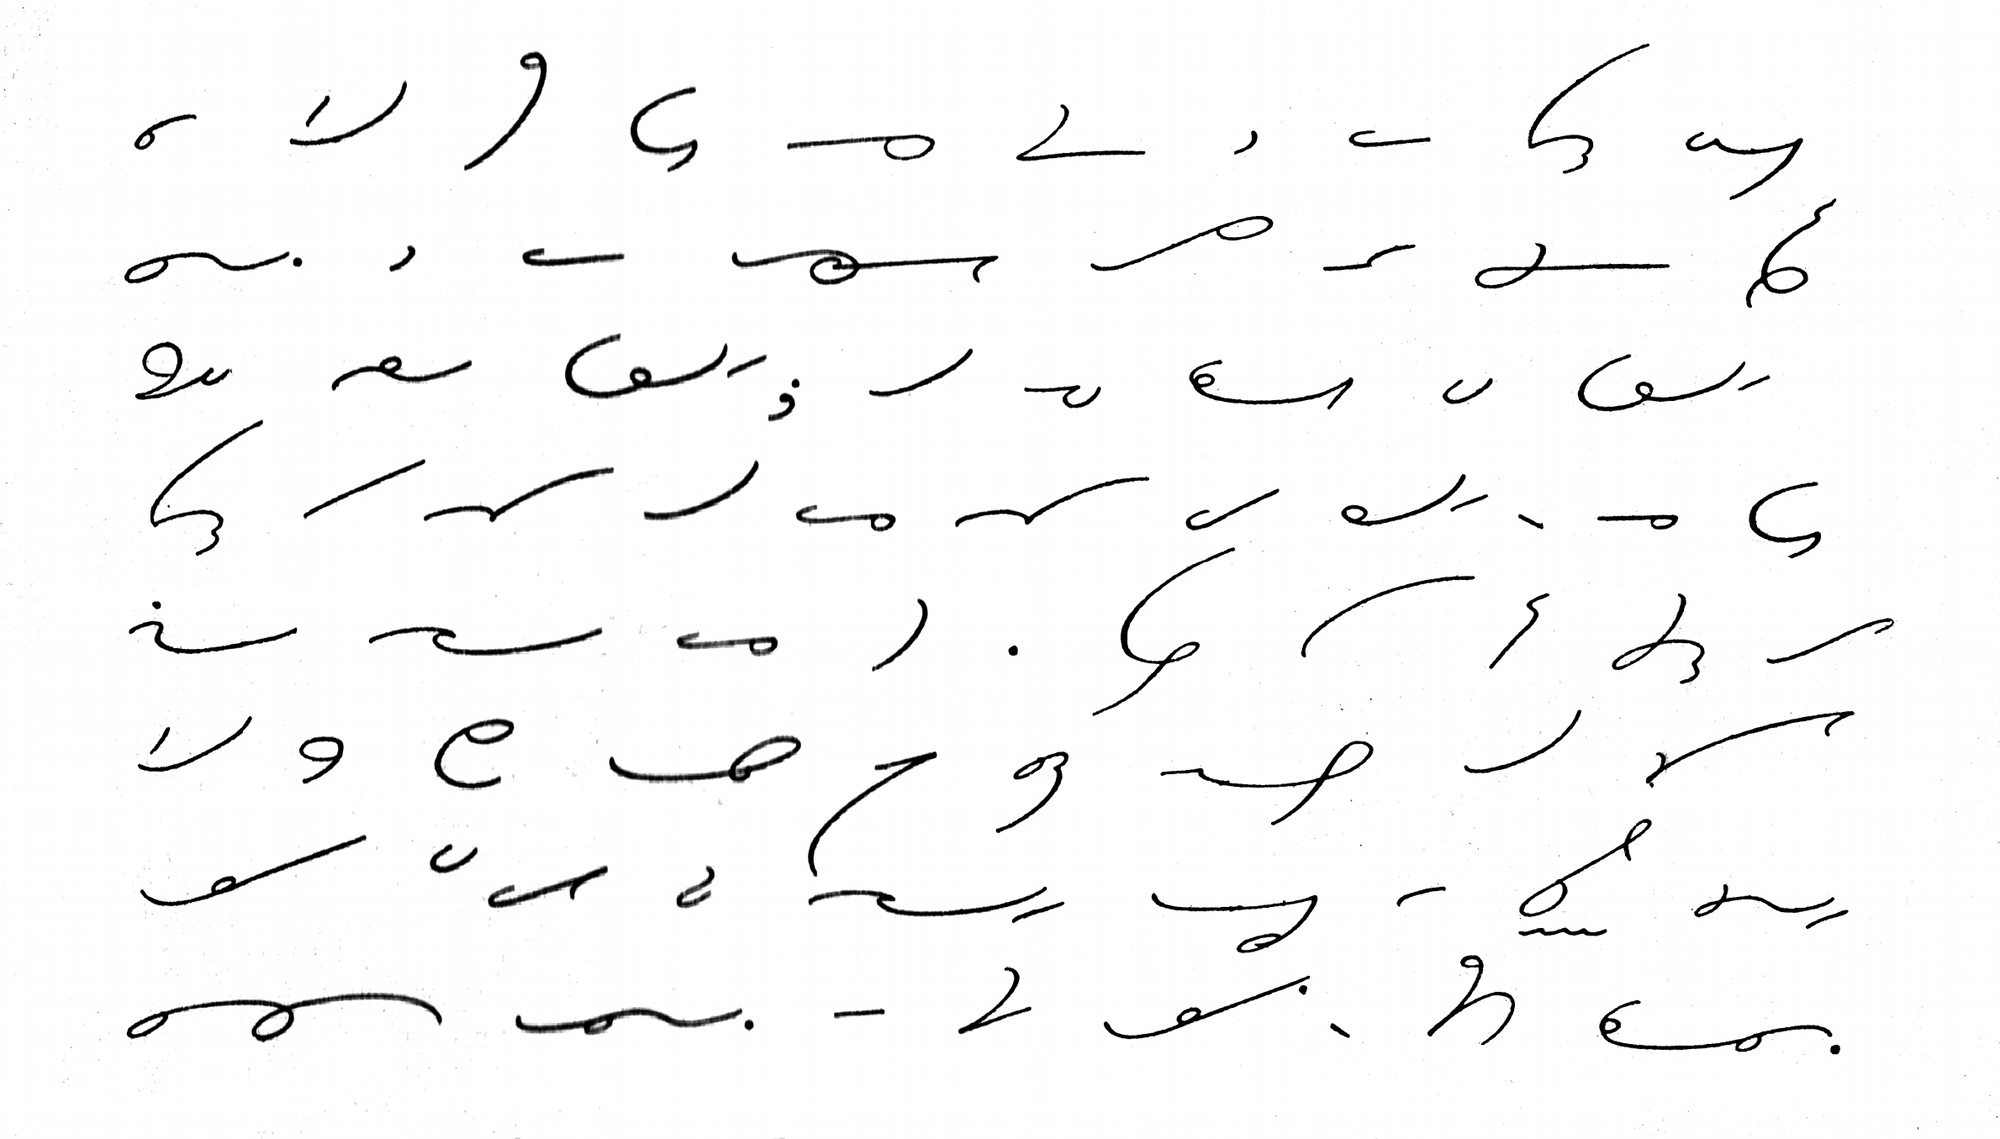 Gregg_shorthand_example